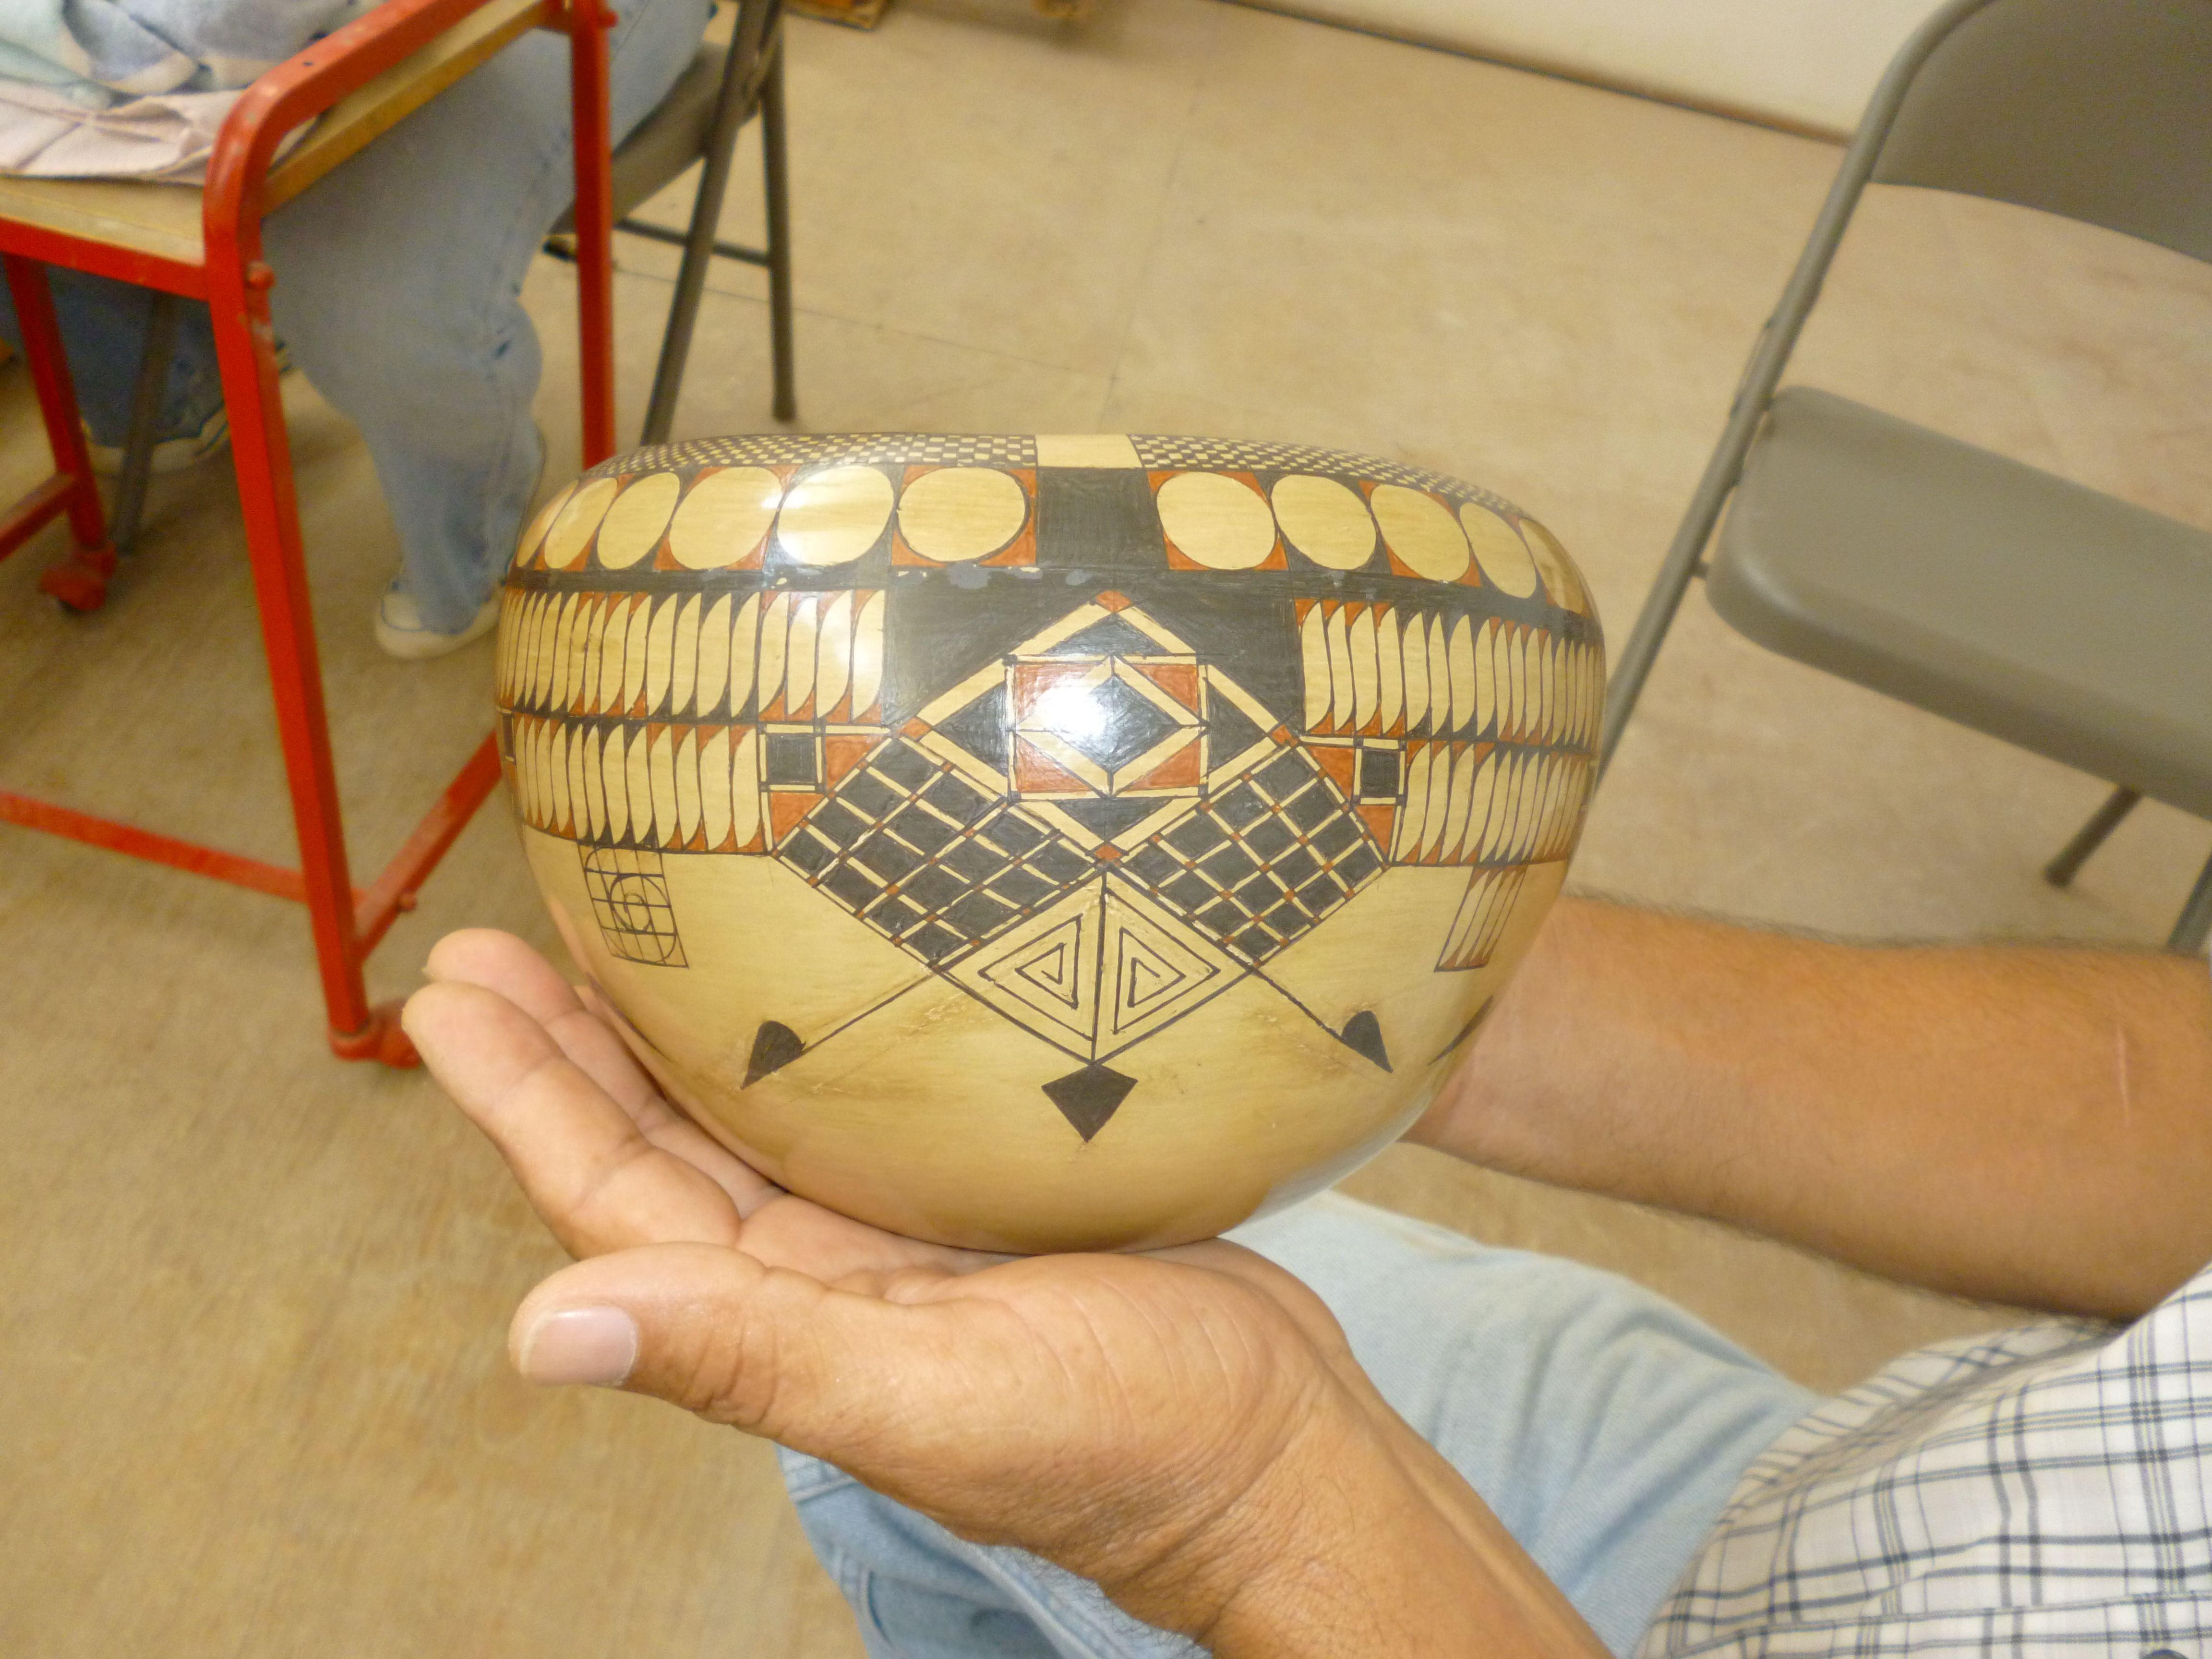 Olla de cerámica Mata Ortiz de la ceramista cancunense Teresa Cervantes, del Taller de cerámica Paquimé del Maestro Eusebio Ortega, en Cancún, Quintana Roo, México.